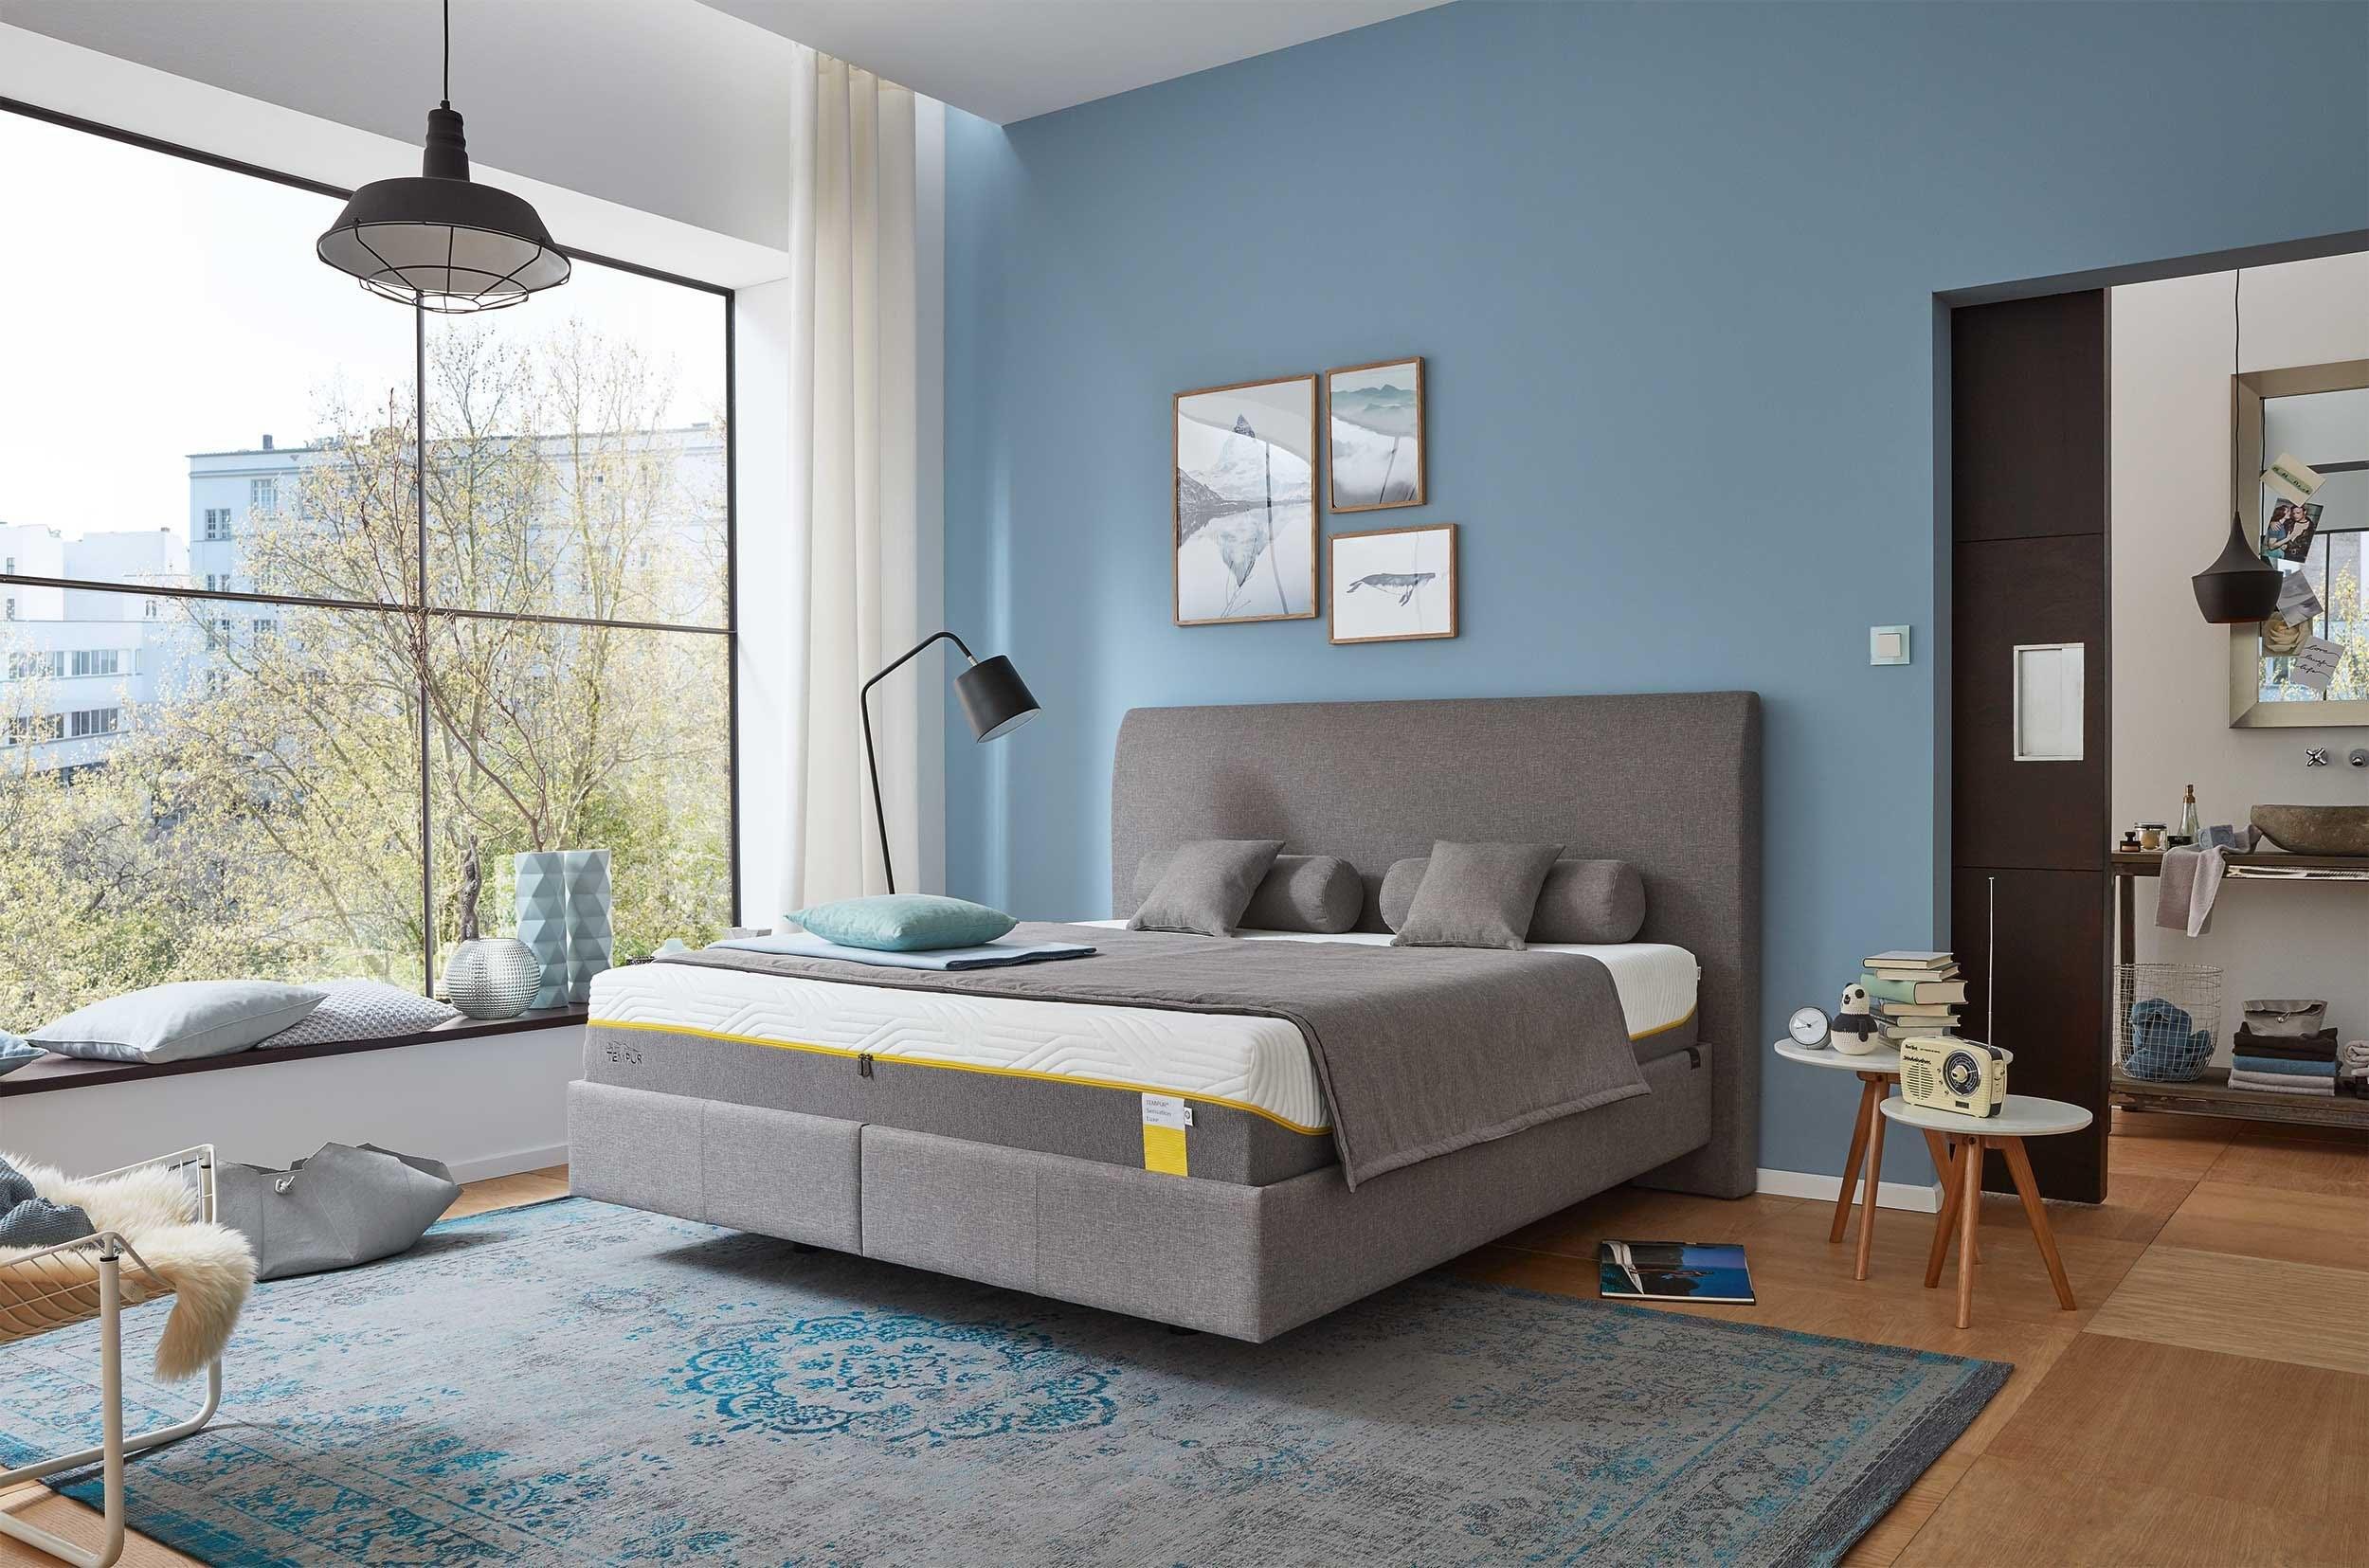 visco matras sensation luxe tempur 30 cm dik. Black Bedroom Furniture Sets. Home Design Ideas